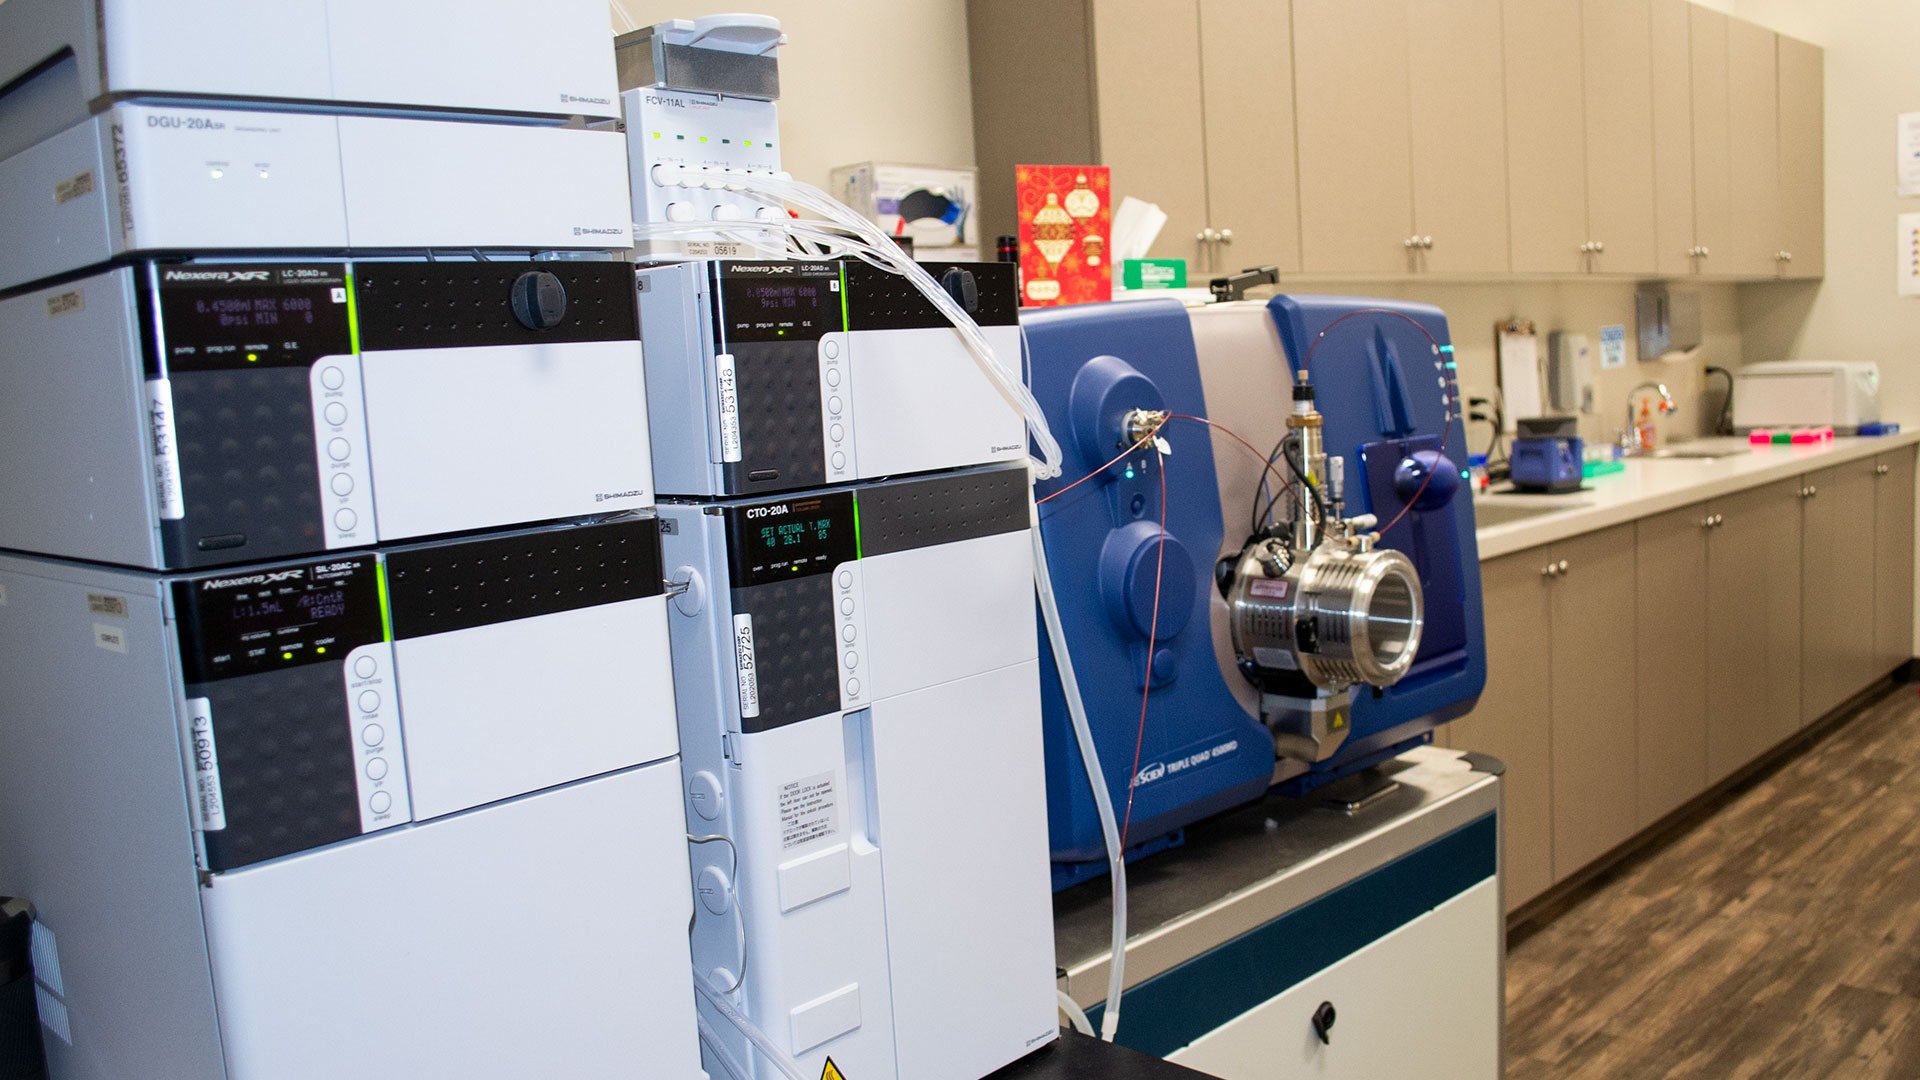 lab 6 - Our Lab